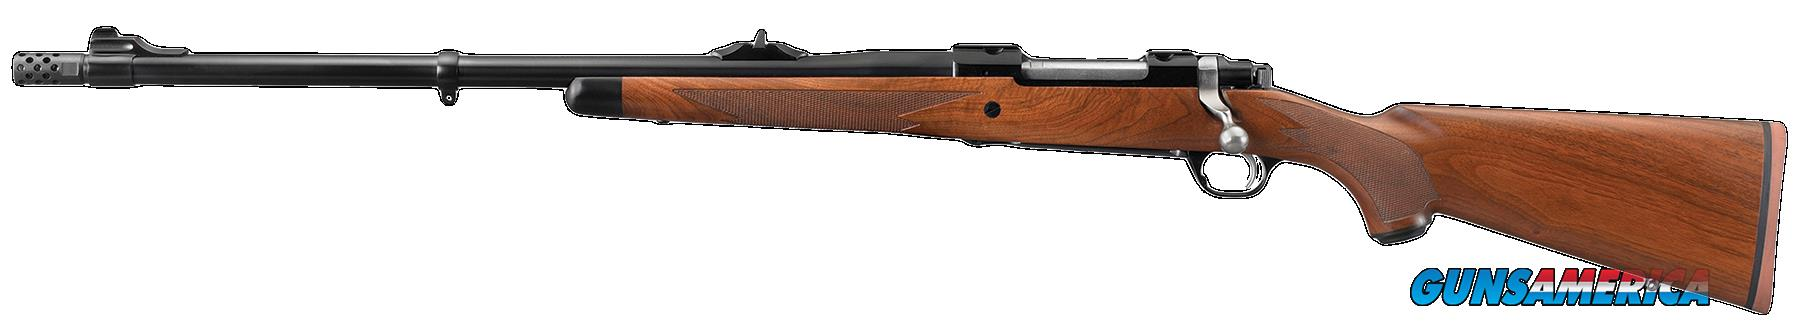 Ruger Hawkeye, Rug 47121 Hawkeye African  375 Rug Mzbrk Lh  Bl  Guns > Pistols > 1911 Pistol Copies (non-Colt)